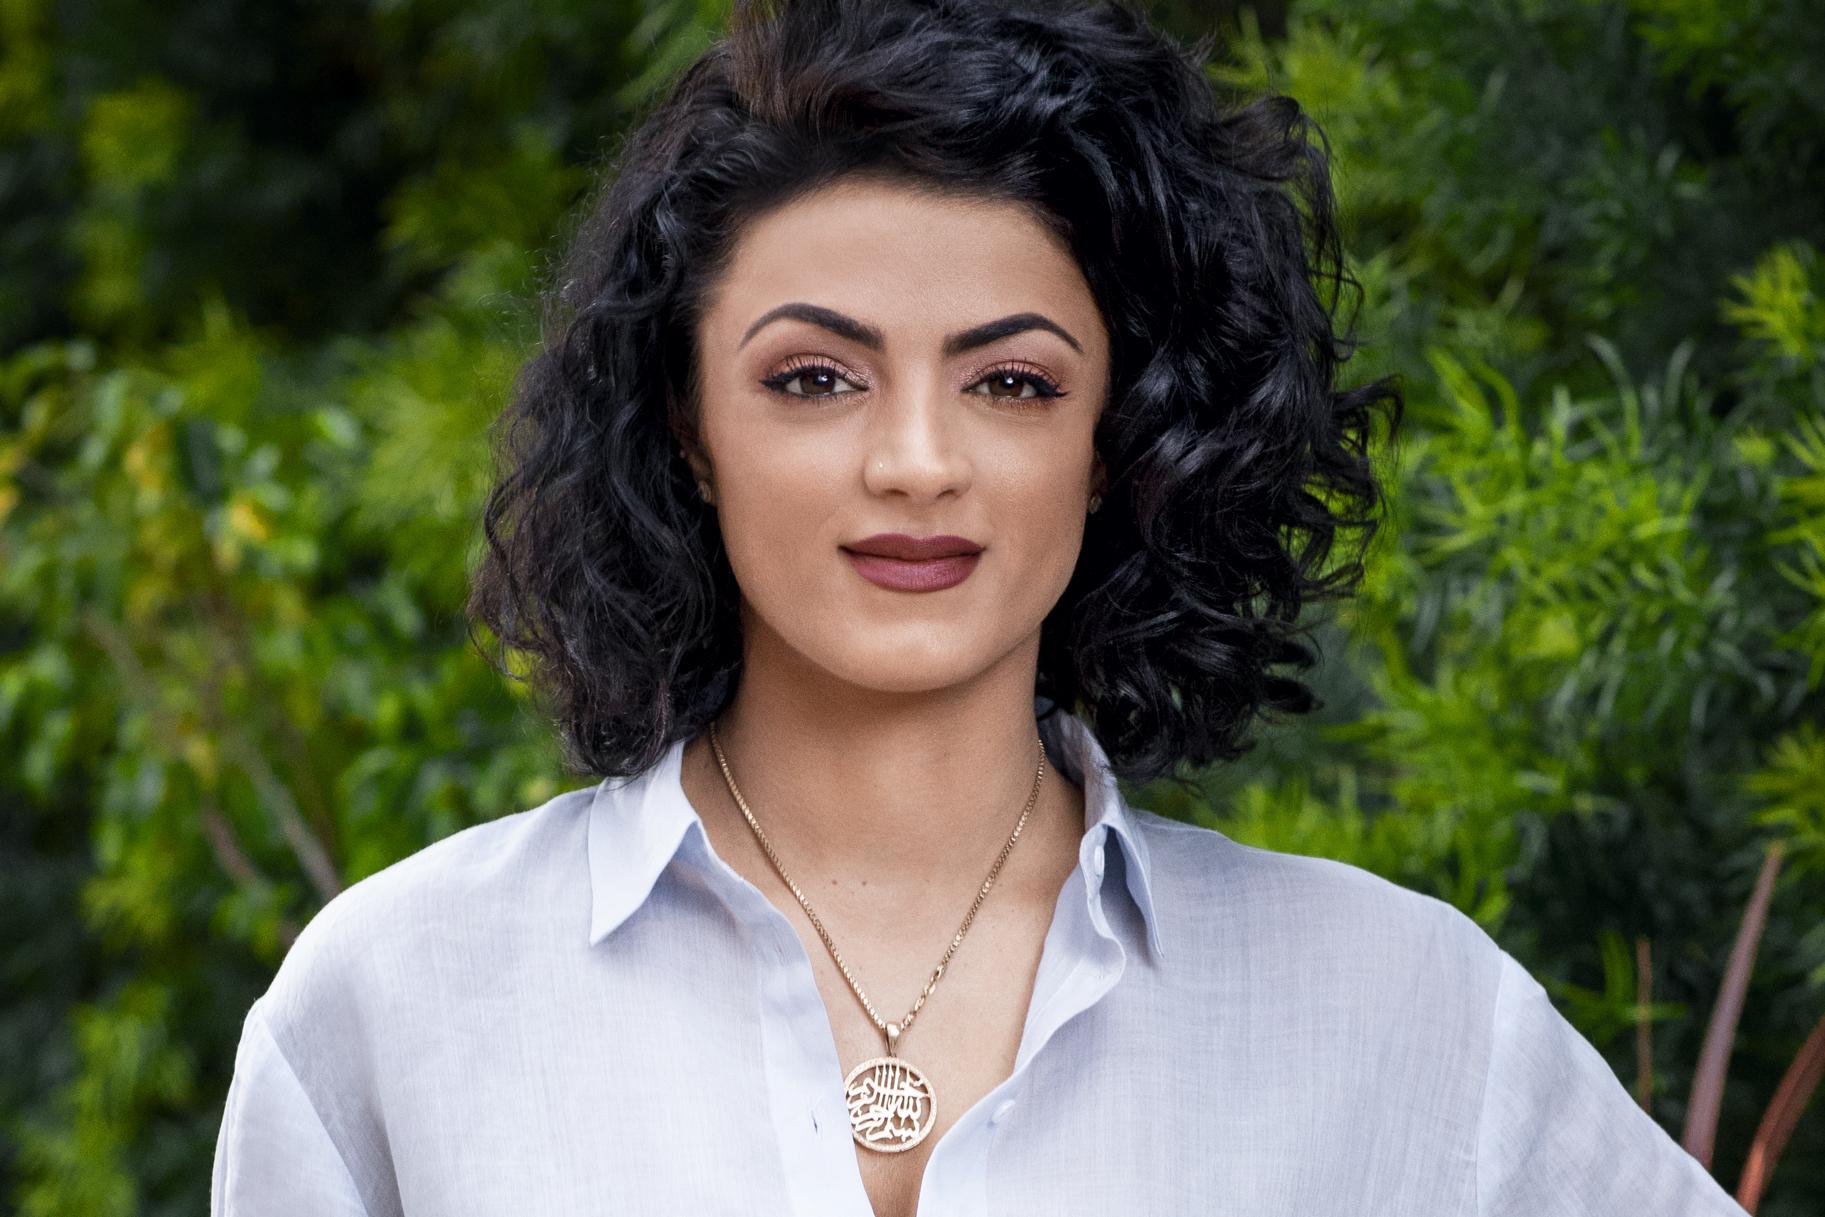 Golnesa Gharachedaghi Gg Baby